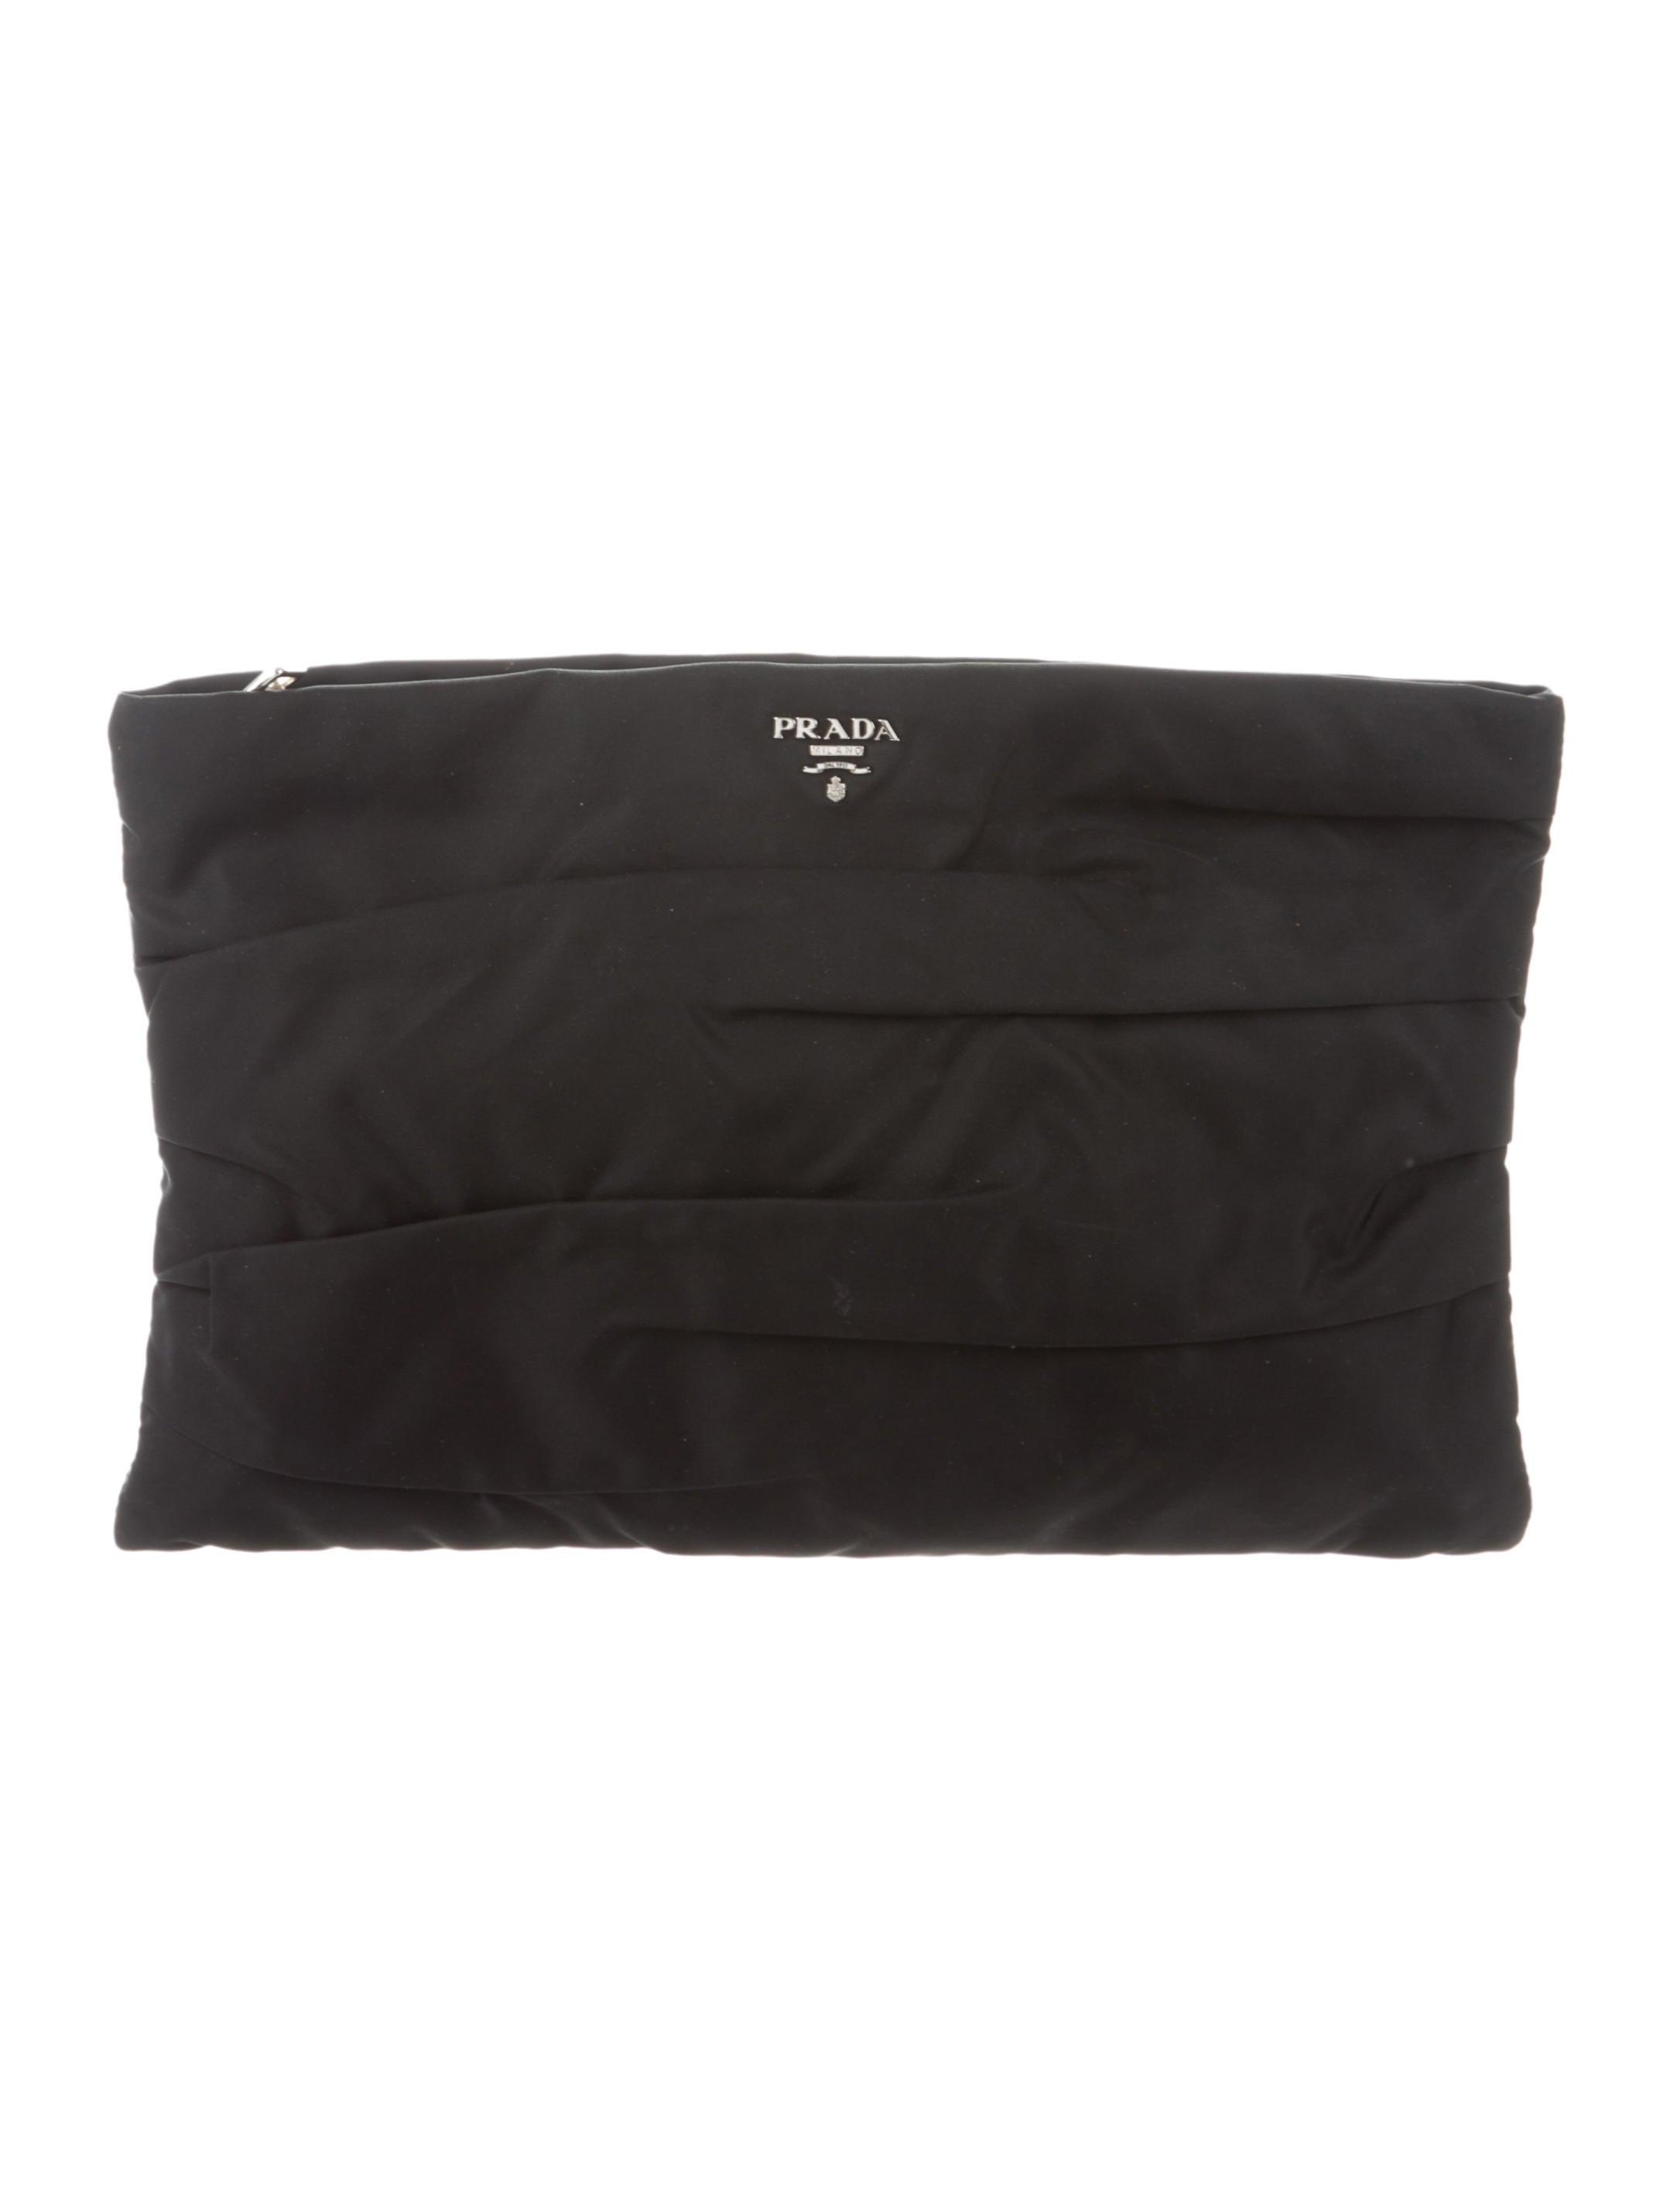 c561419c10d5 Prada Tessuto Zip Clutch - Handbags - PRA268901